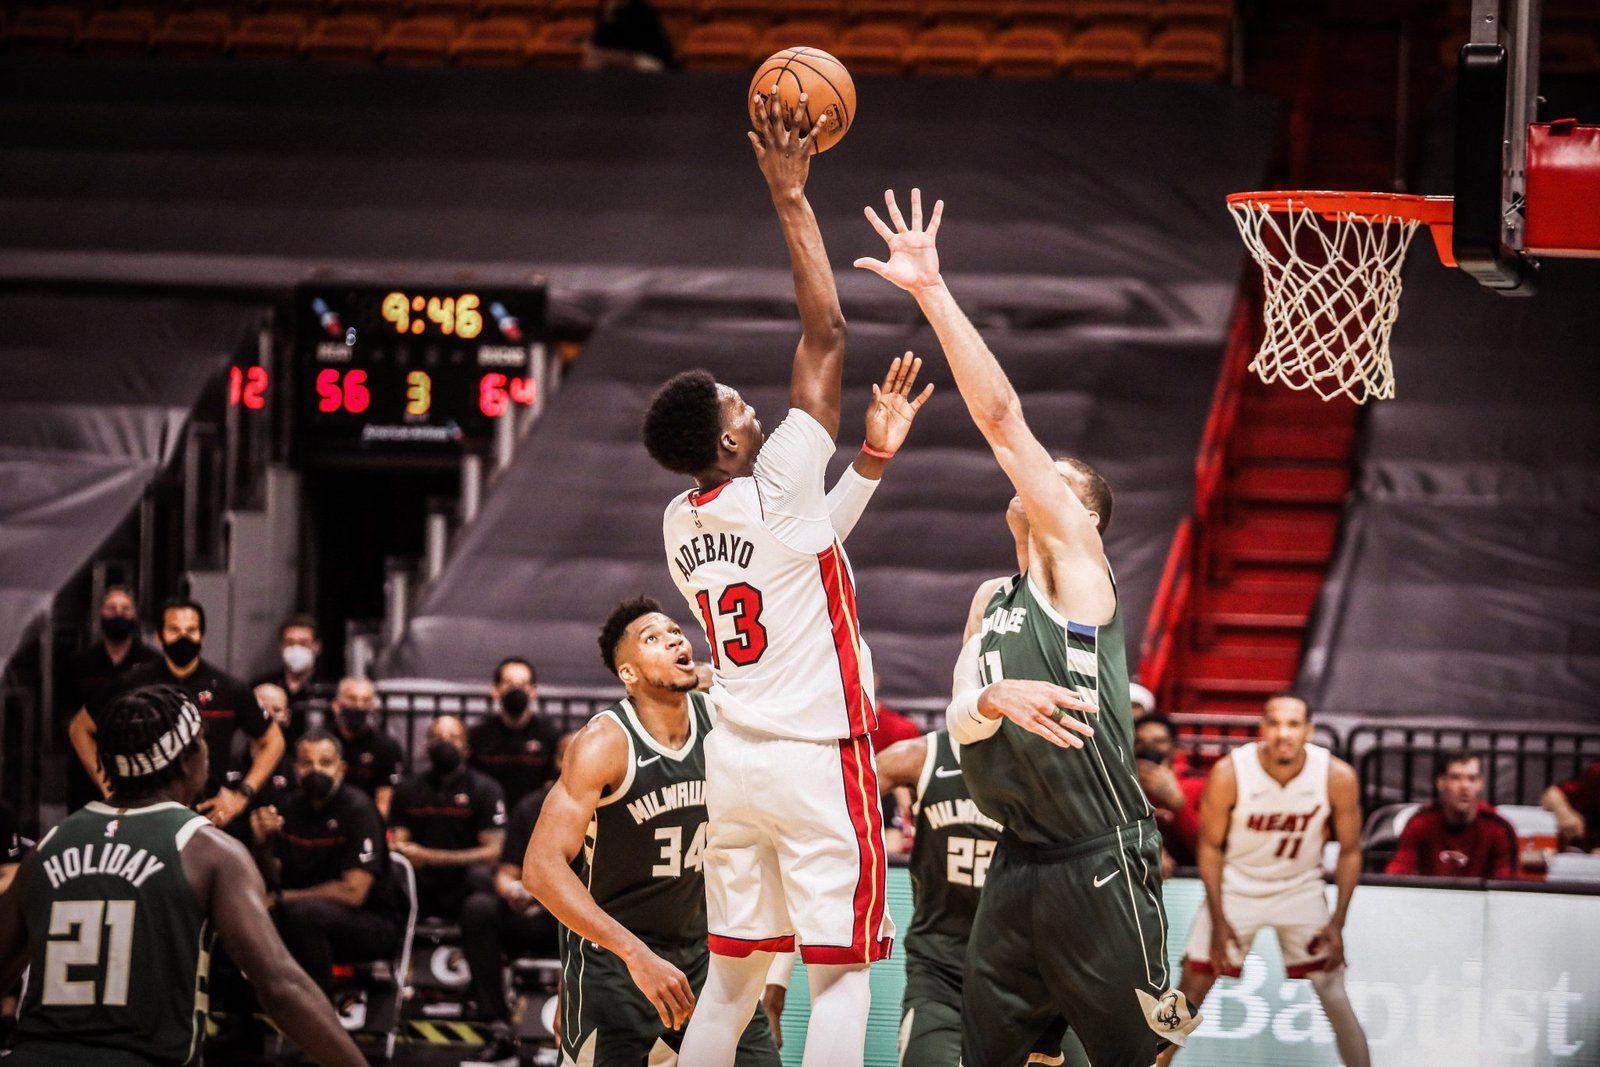 Bam Adebayo et le Miami Heat résistent au triple-double de Giannis Antetokounmpo